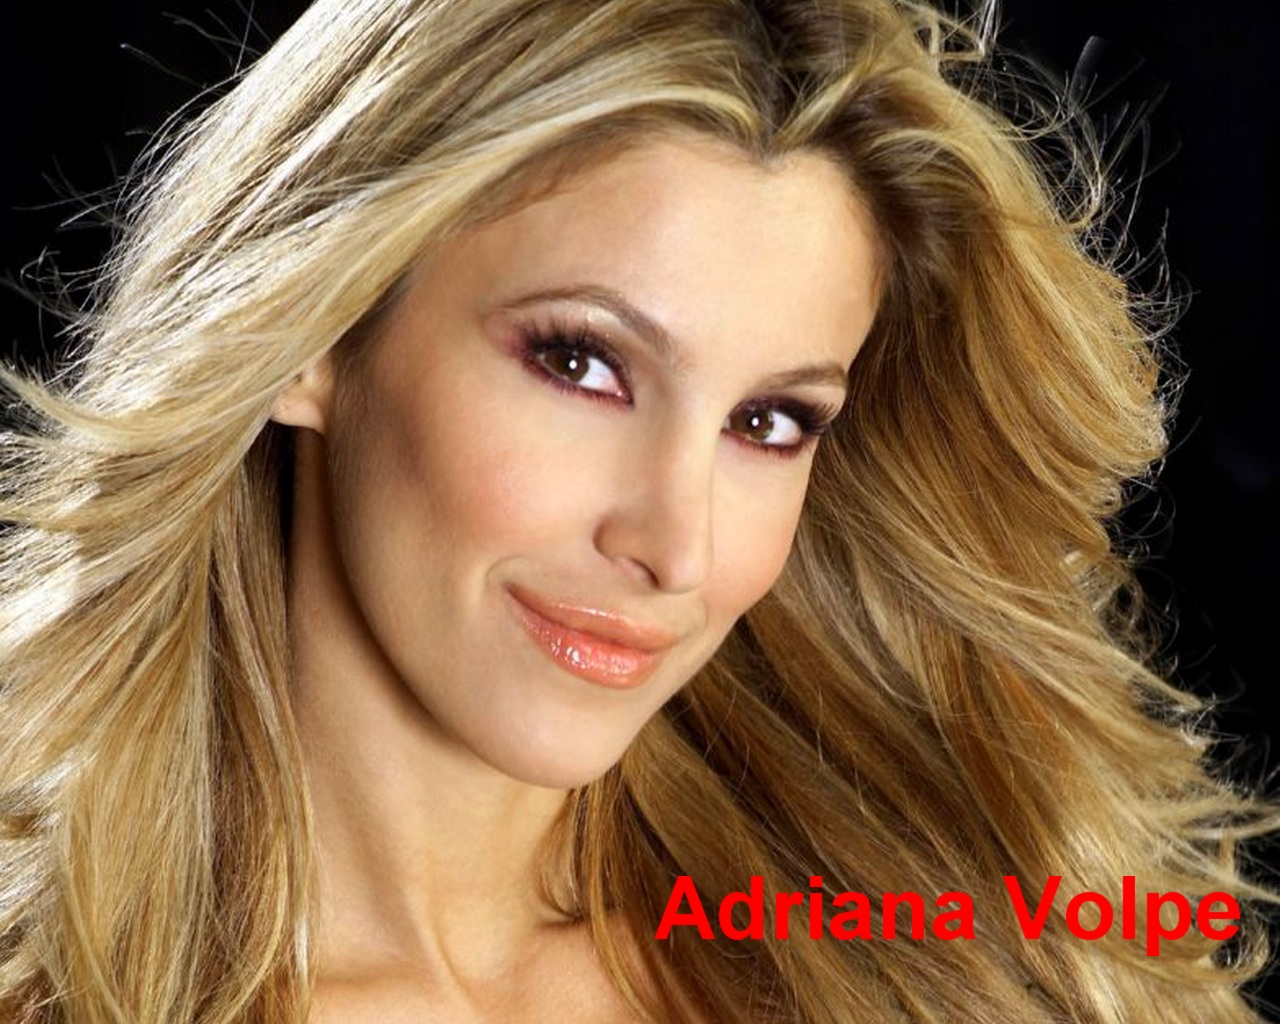 http://1.bp.blogspot.com/-PEb1LuDuo_M/T3gfvu4suBI/AAAAAAADzZw/sZosRlV-55w/s1600/Adriana+Volpe+Wallpaper+02.jpg